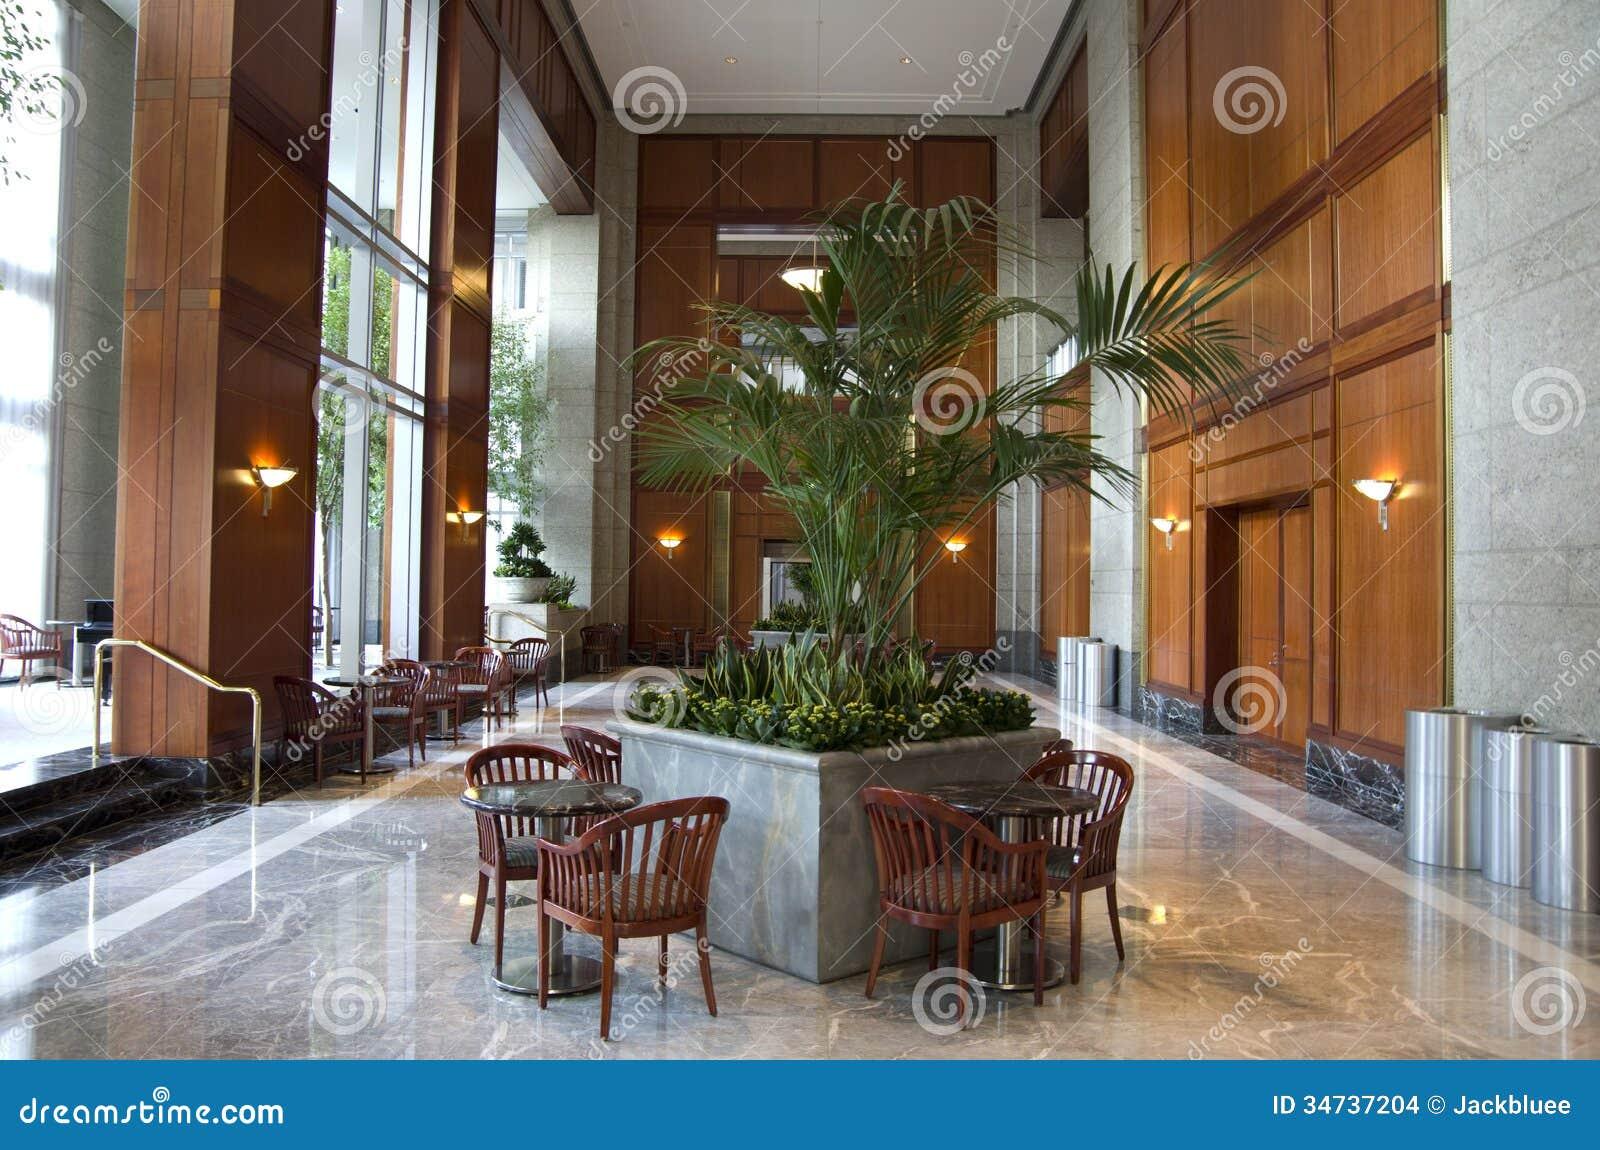 Business Building Lobby Interior Interiors Design Designs Stock Images Image 34737204